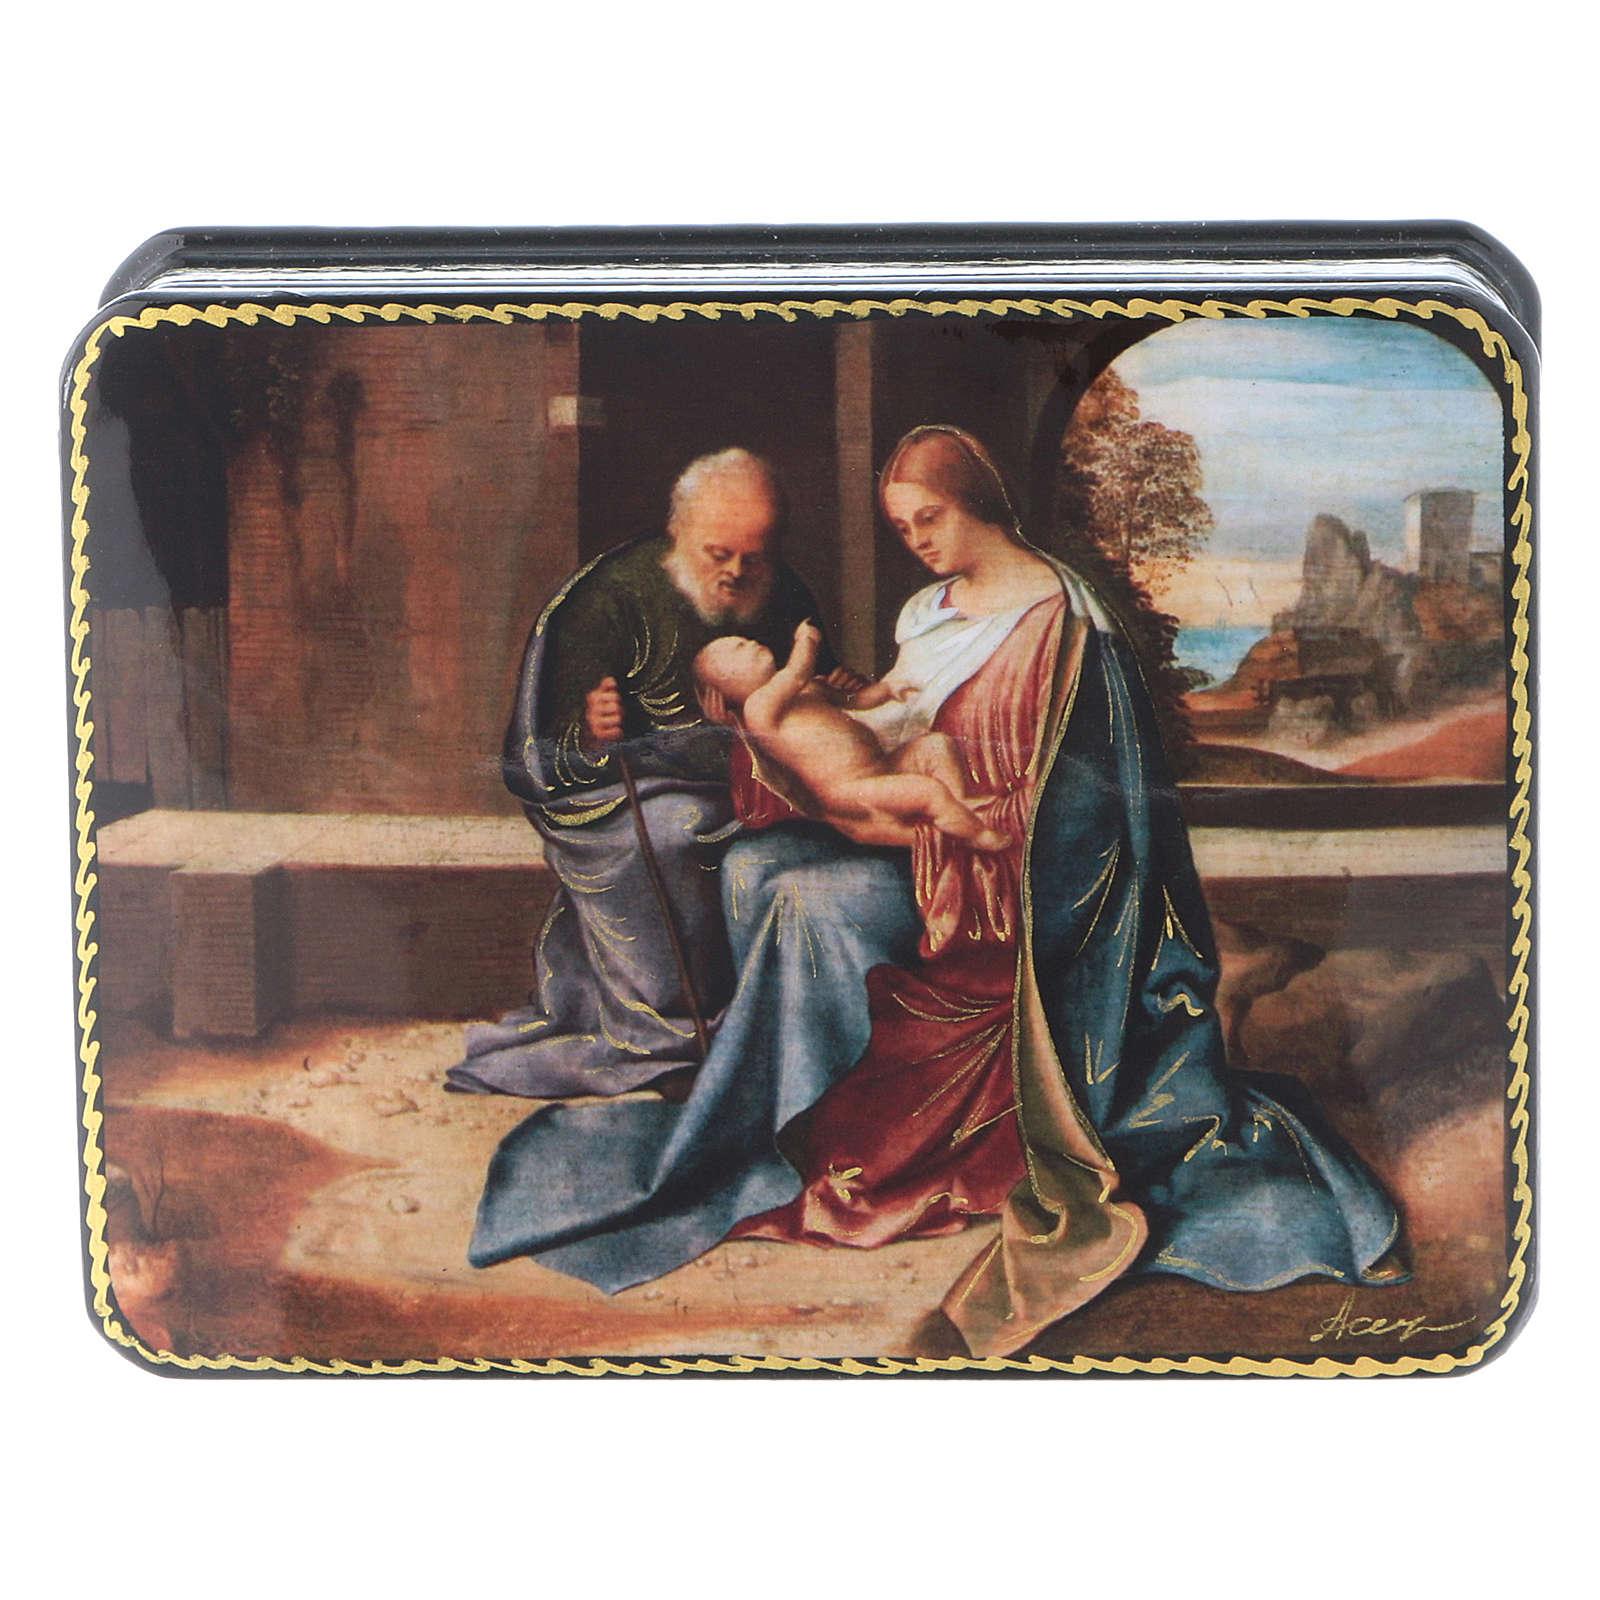 Scatola russa Papier-mâché Nascita Gesù rinascimentale Fedoskino style 11x8 4